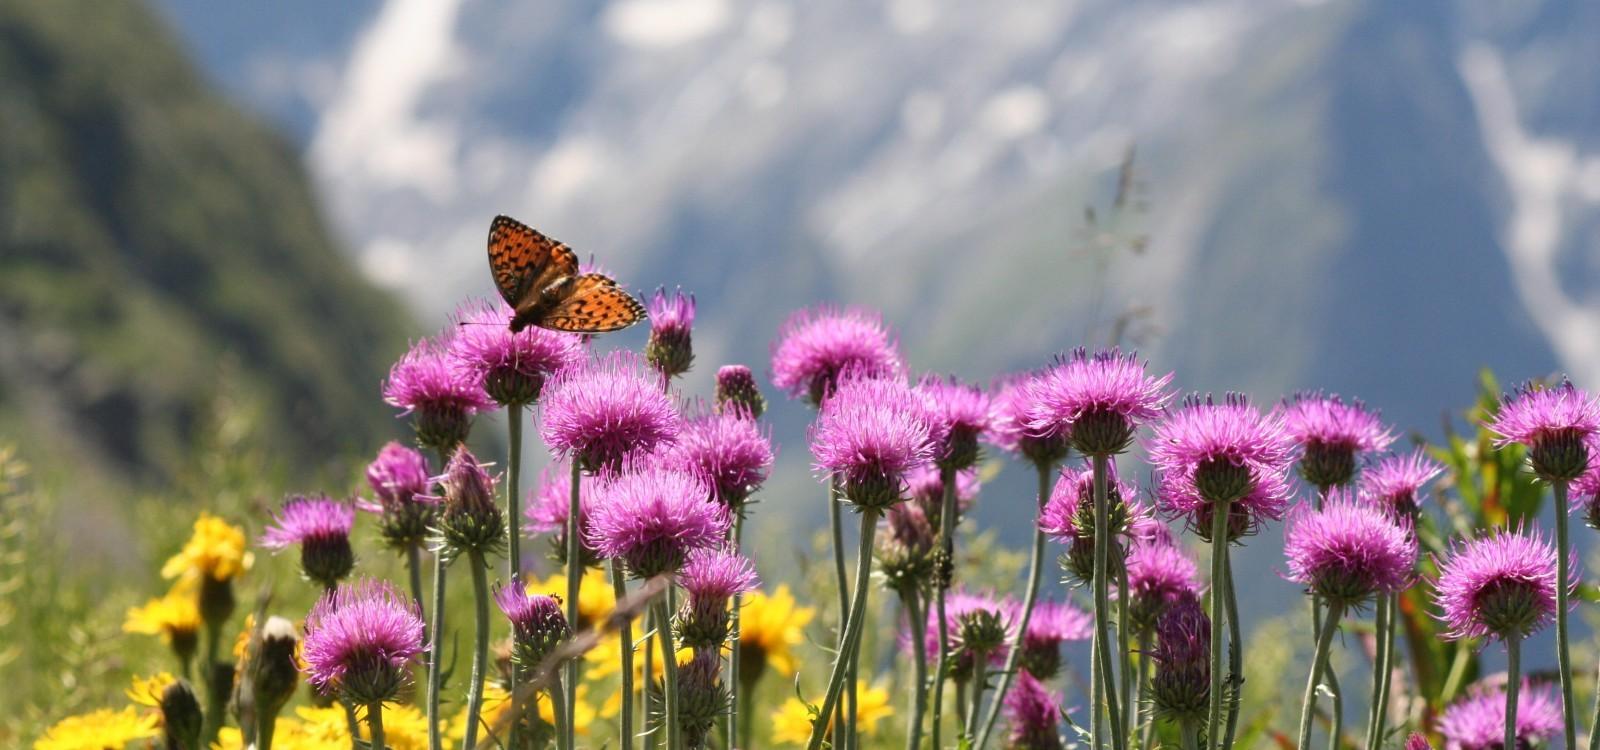 Bergfrühling - Angebote Berchtesgaden